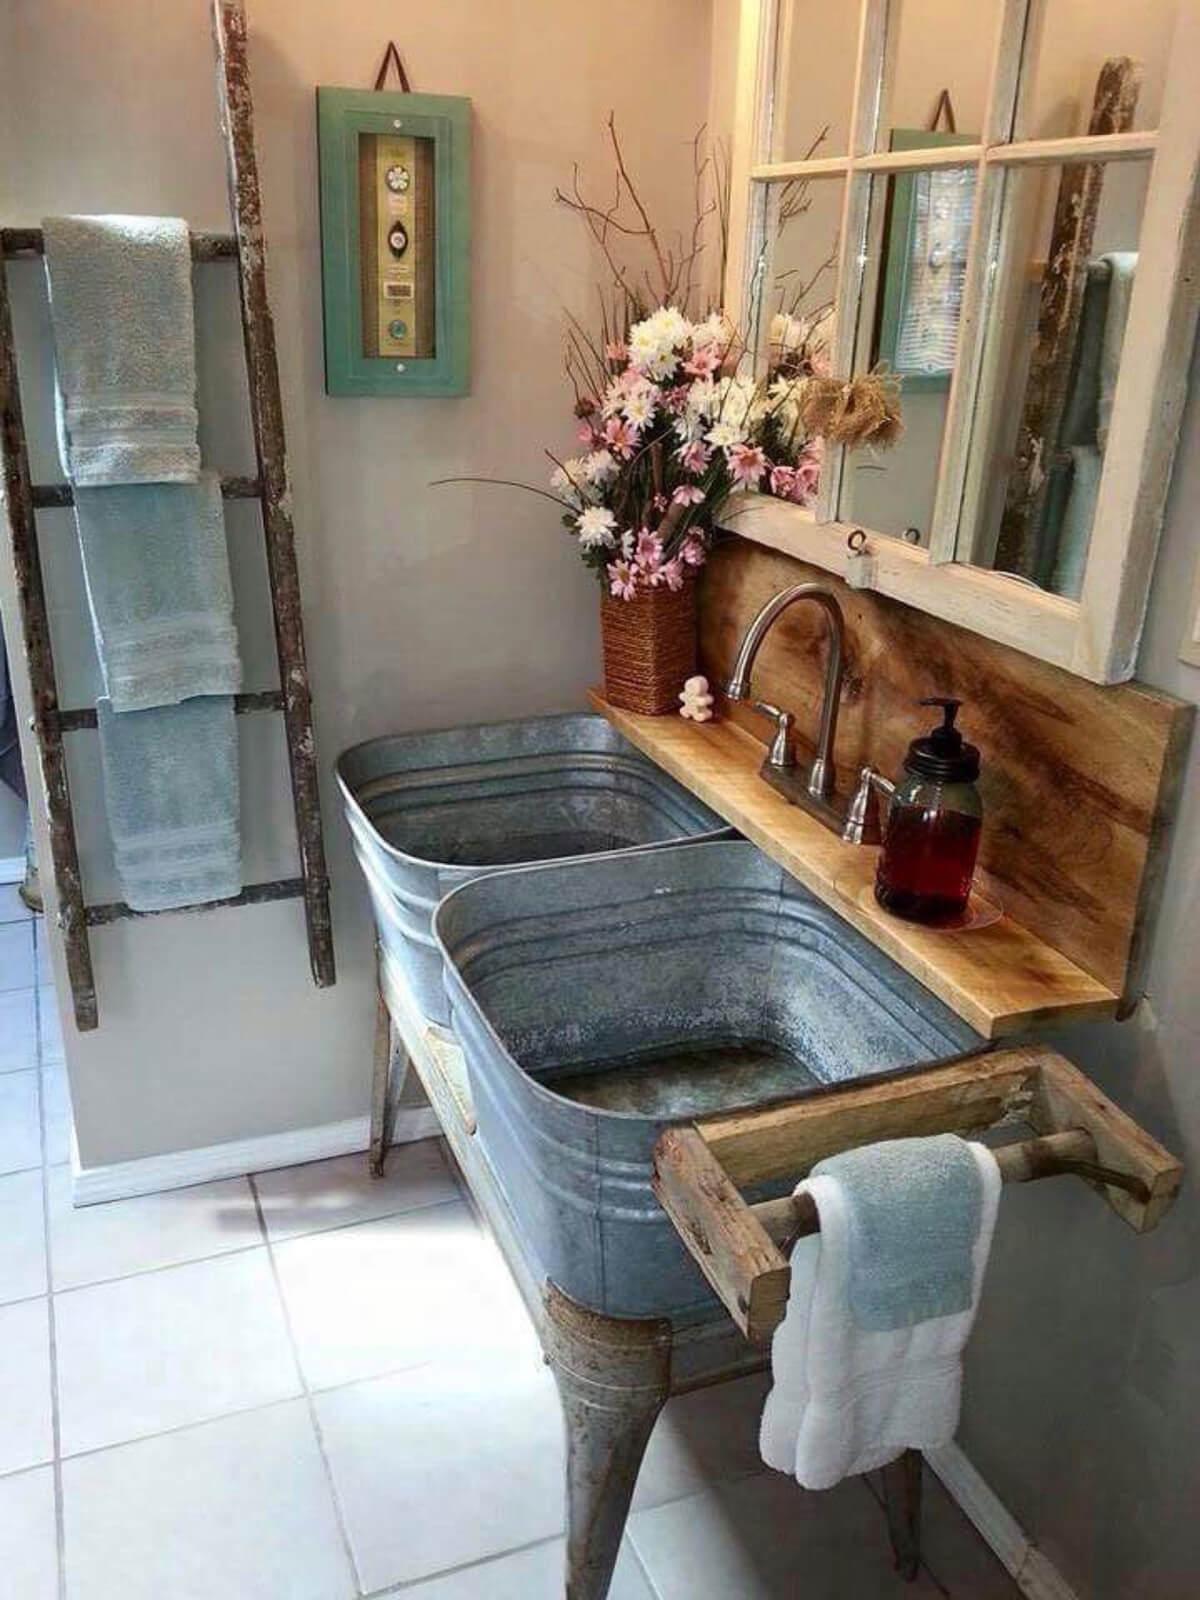 Rustic Barn-Inspired Sinks and Backsplash